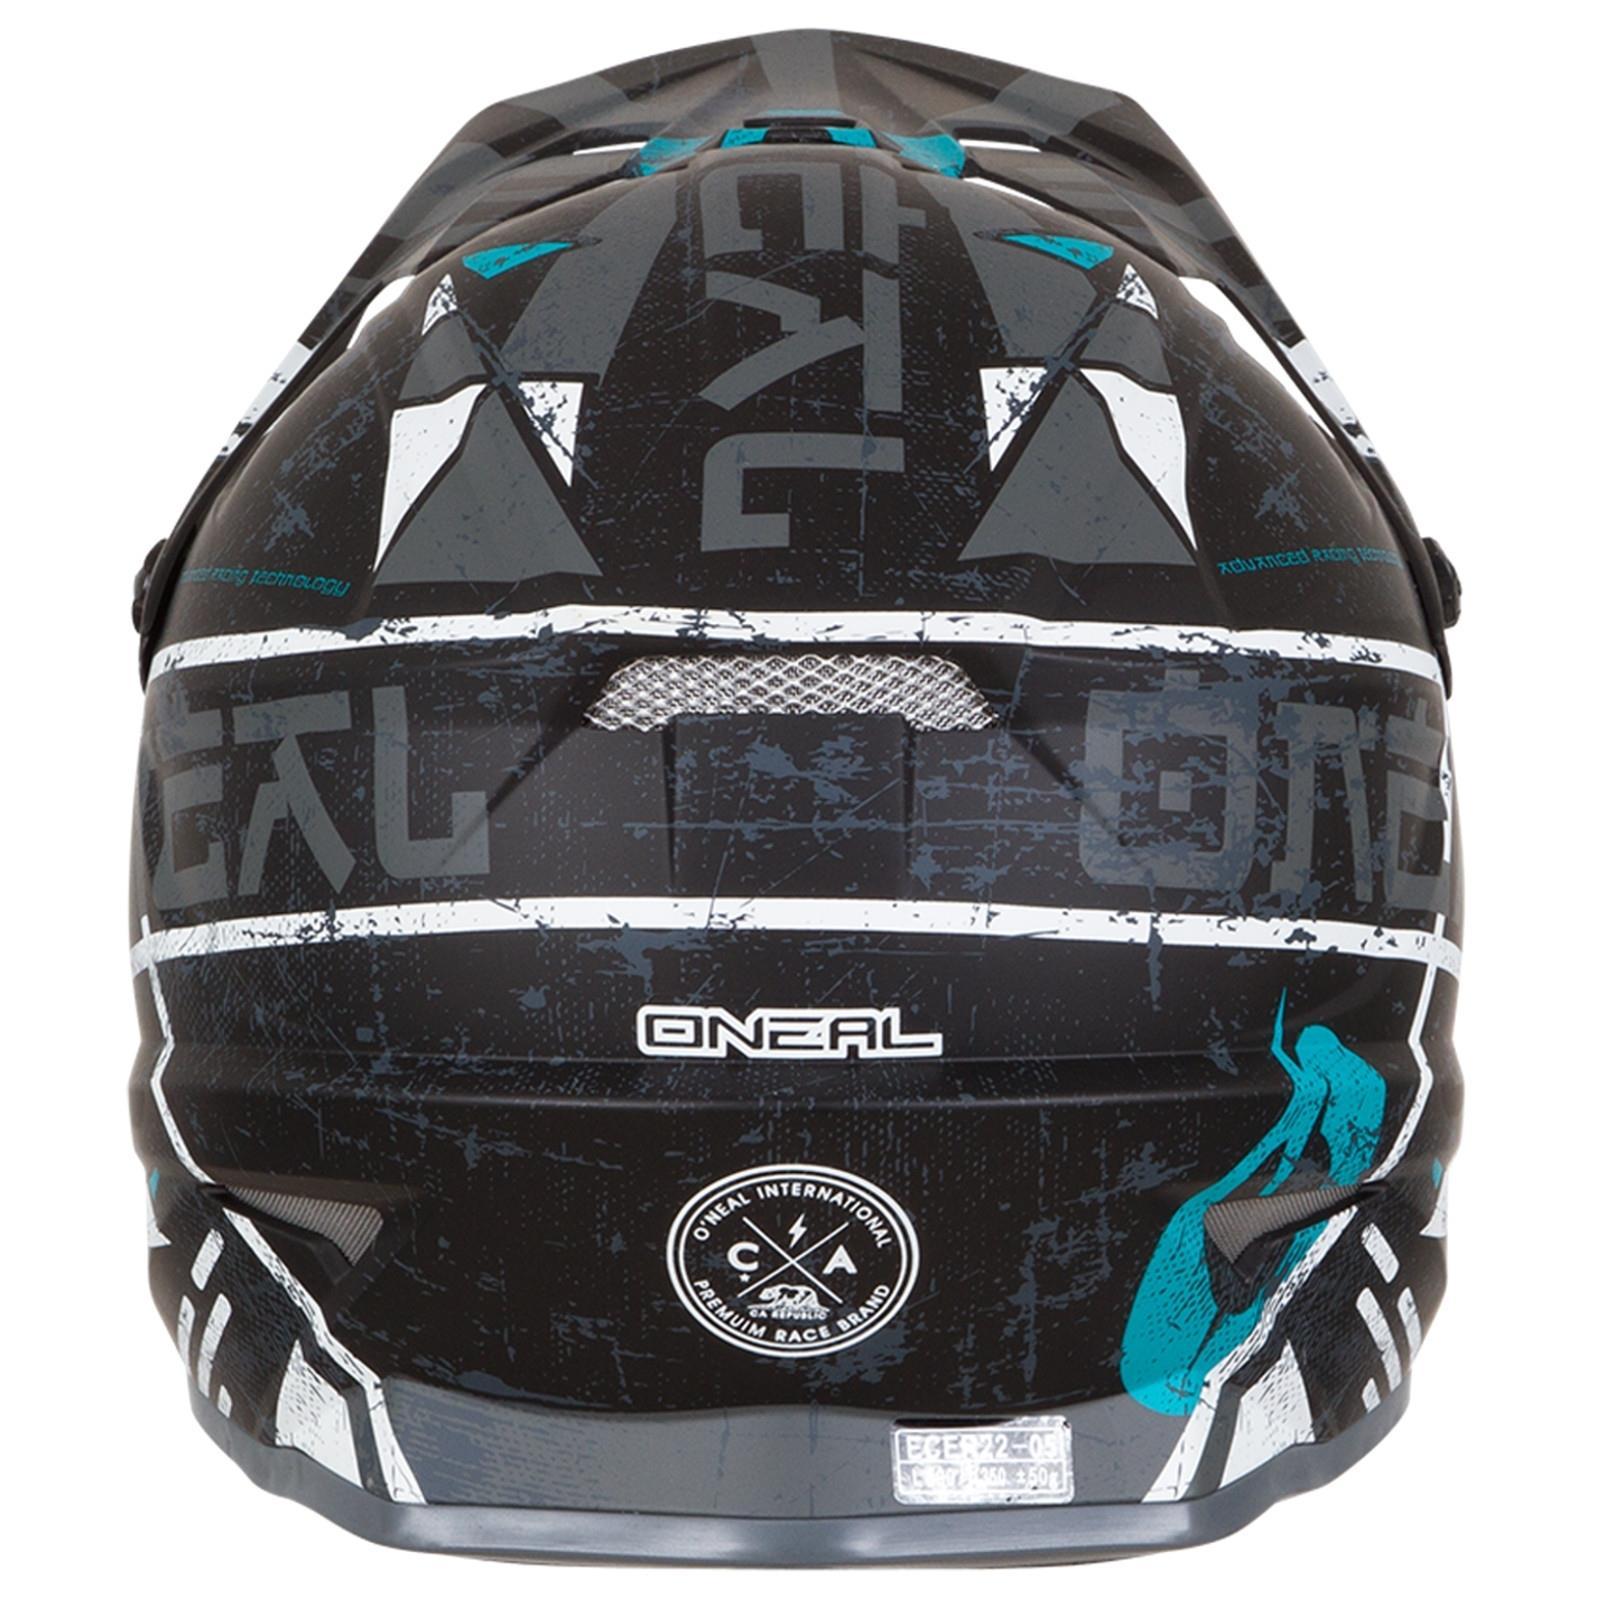 ONeal-Motocross-casco-MX-ENDURO-MOTO-BICI-FUORISTRADA-CROSS-Series-Adventure miniatura 35